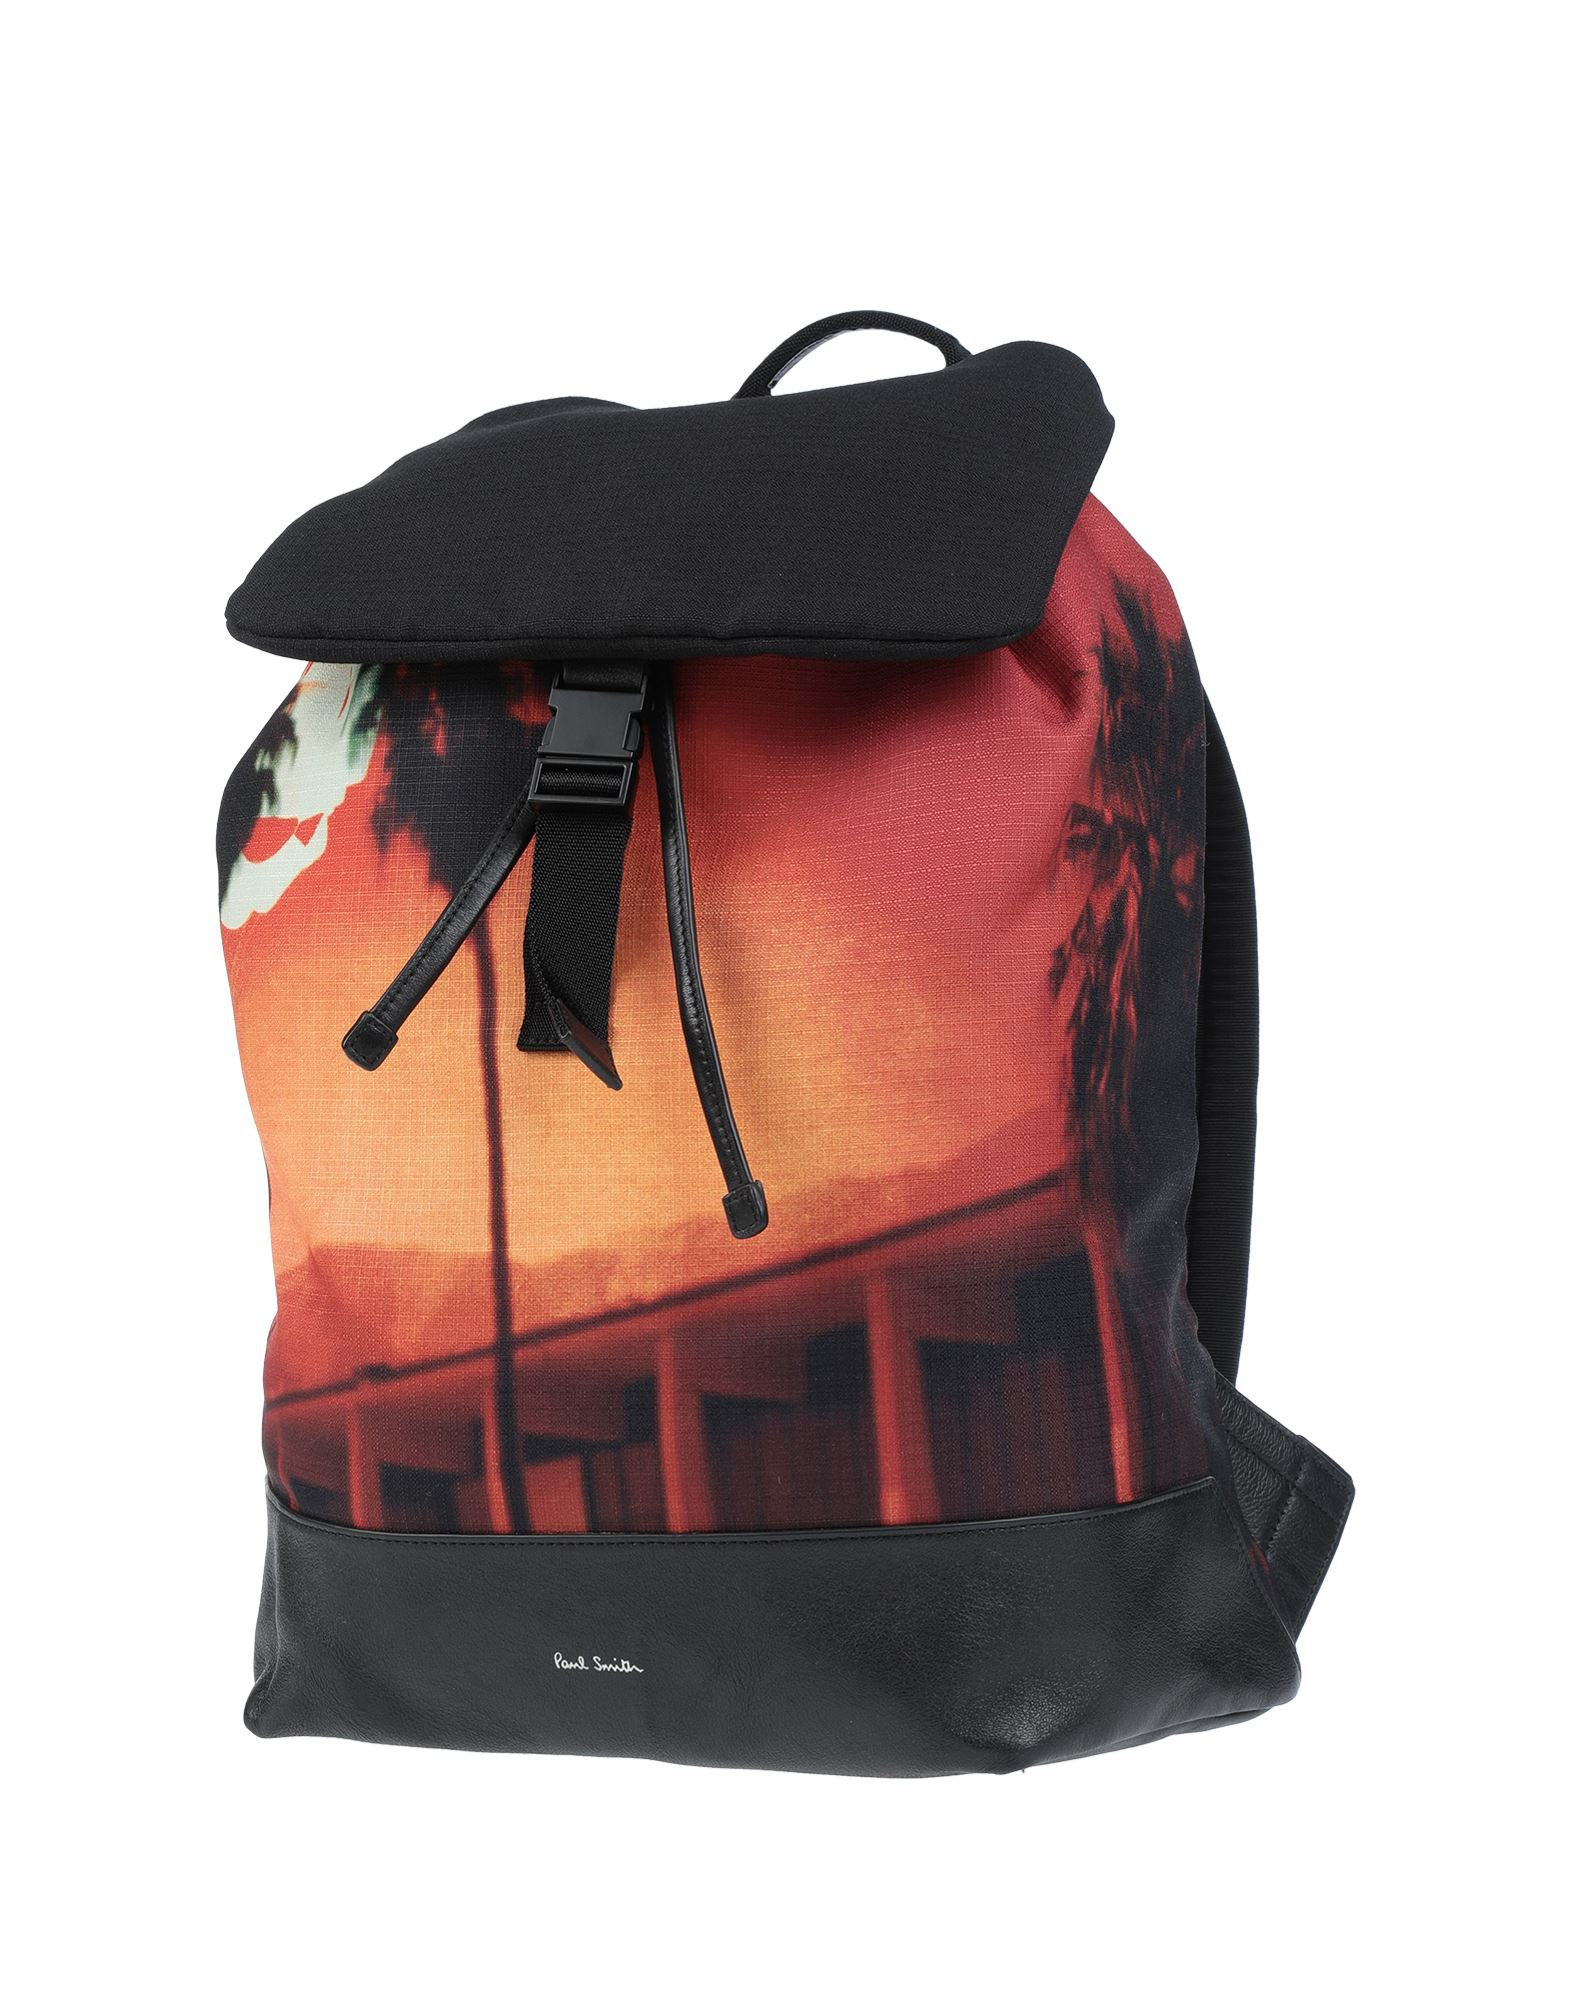 Фото - PAUL SMITH Рюкзаки и сумки на пояс paul smith деловые сумки